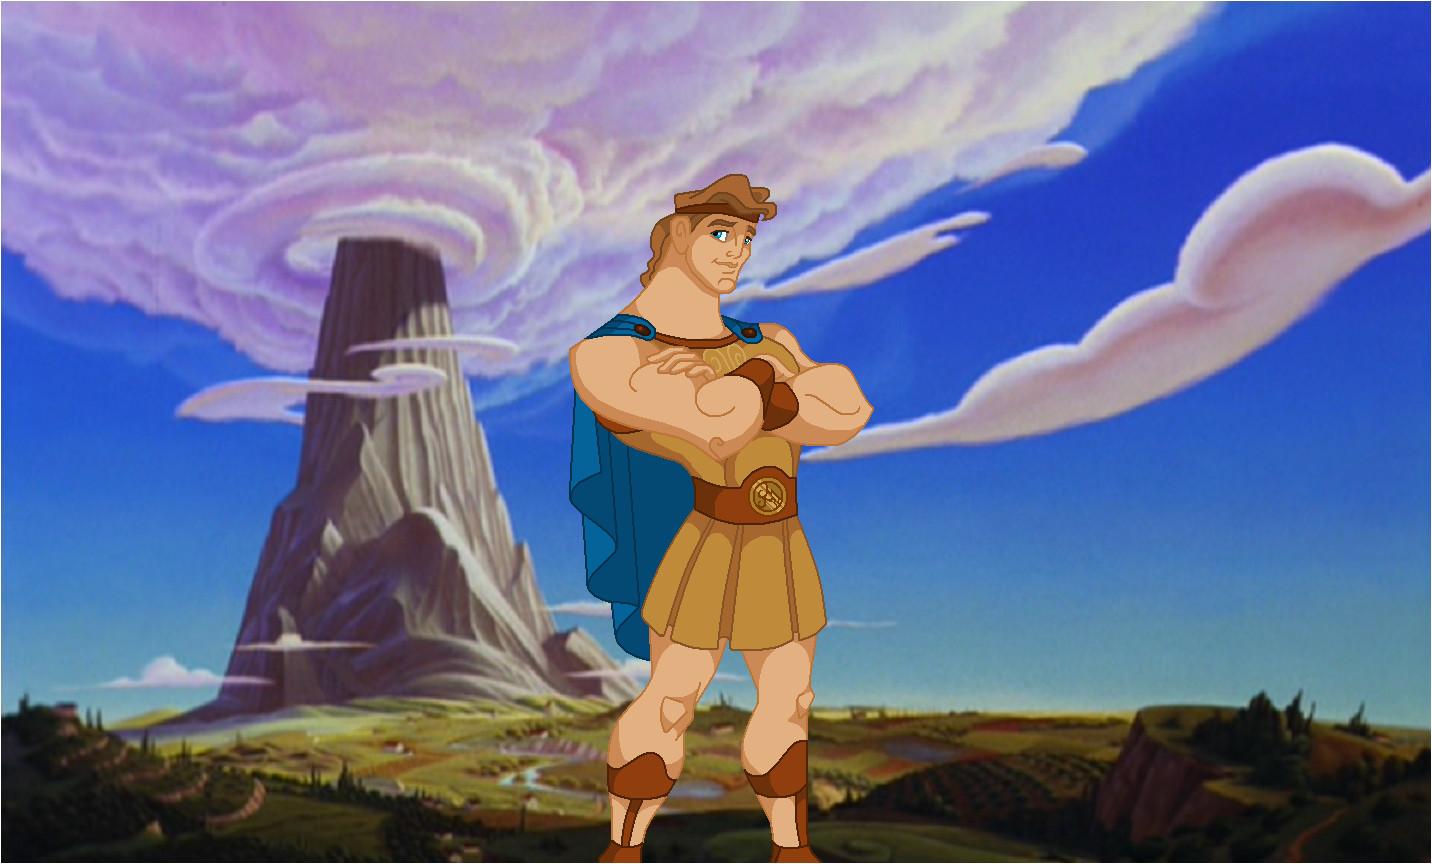 Mythology clipart mt olympus DeviantArt by Mount Olympus galaxcardinal